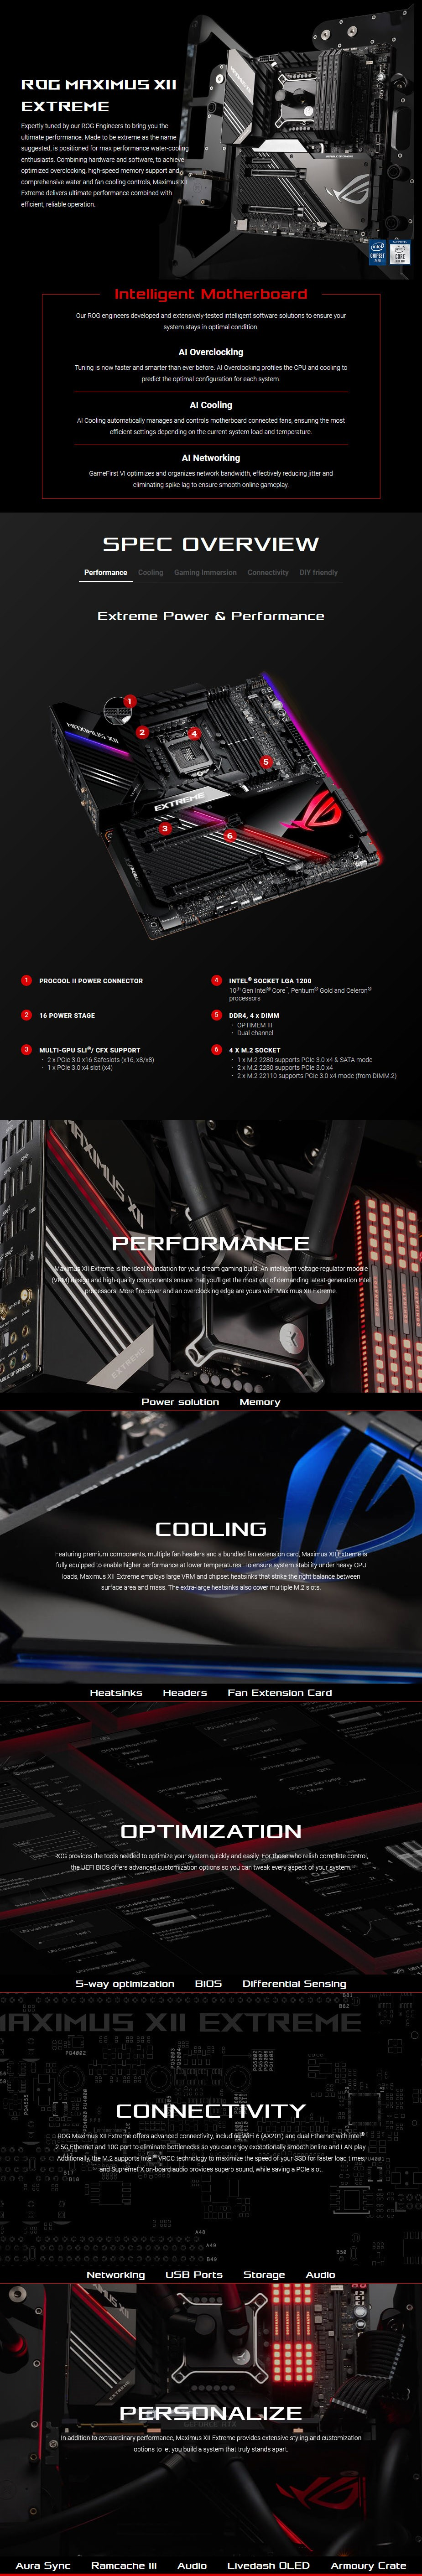 asus-rog-z490-maximus-xii-extreme-lga-1200-eatx-motherboard-ac34930-8.jpg